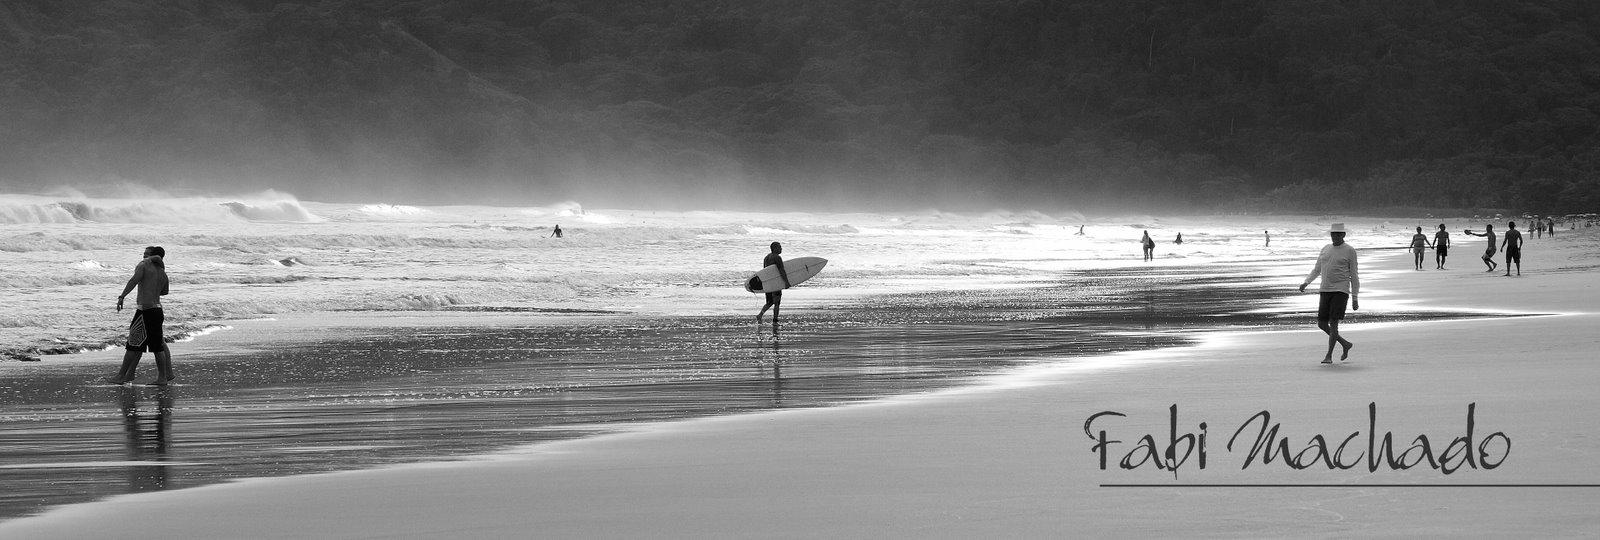 Fabi Machado Fotógrafa